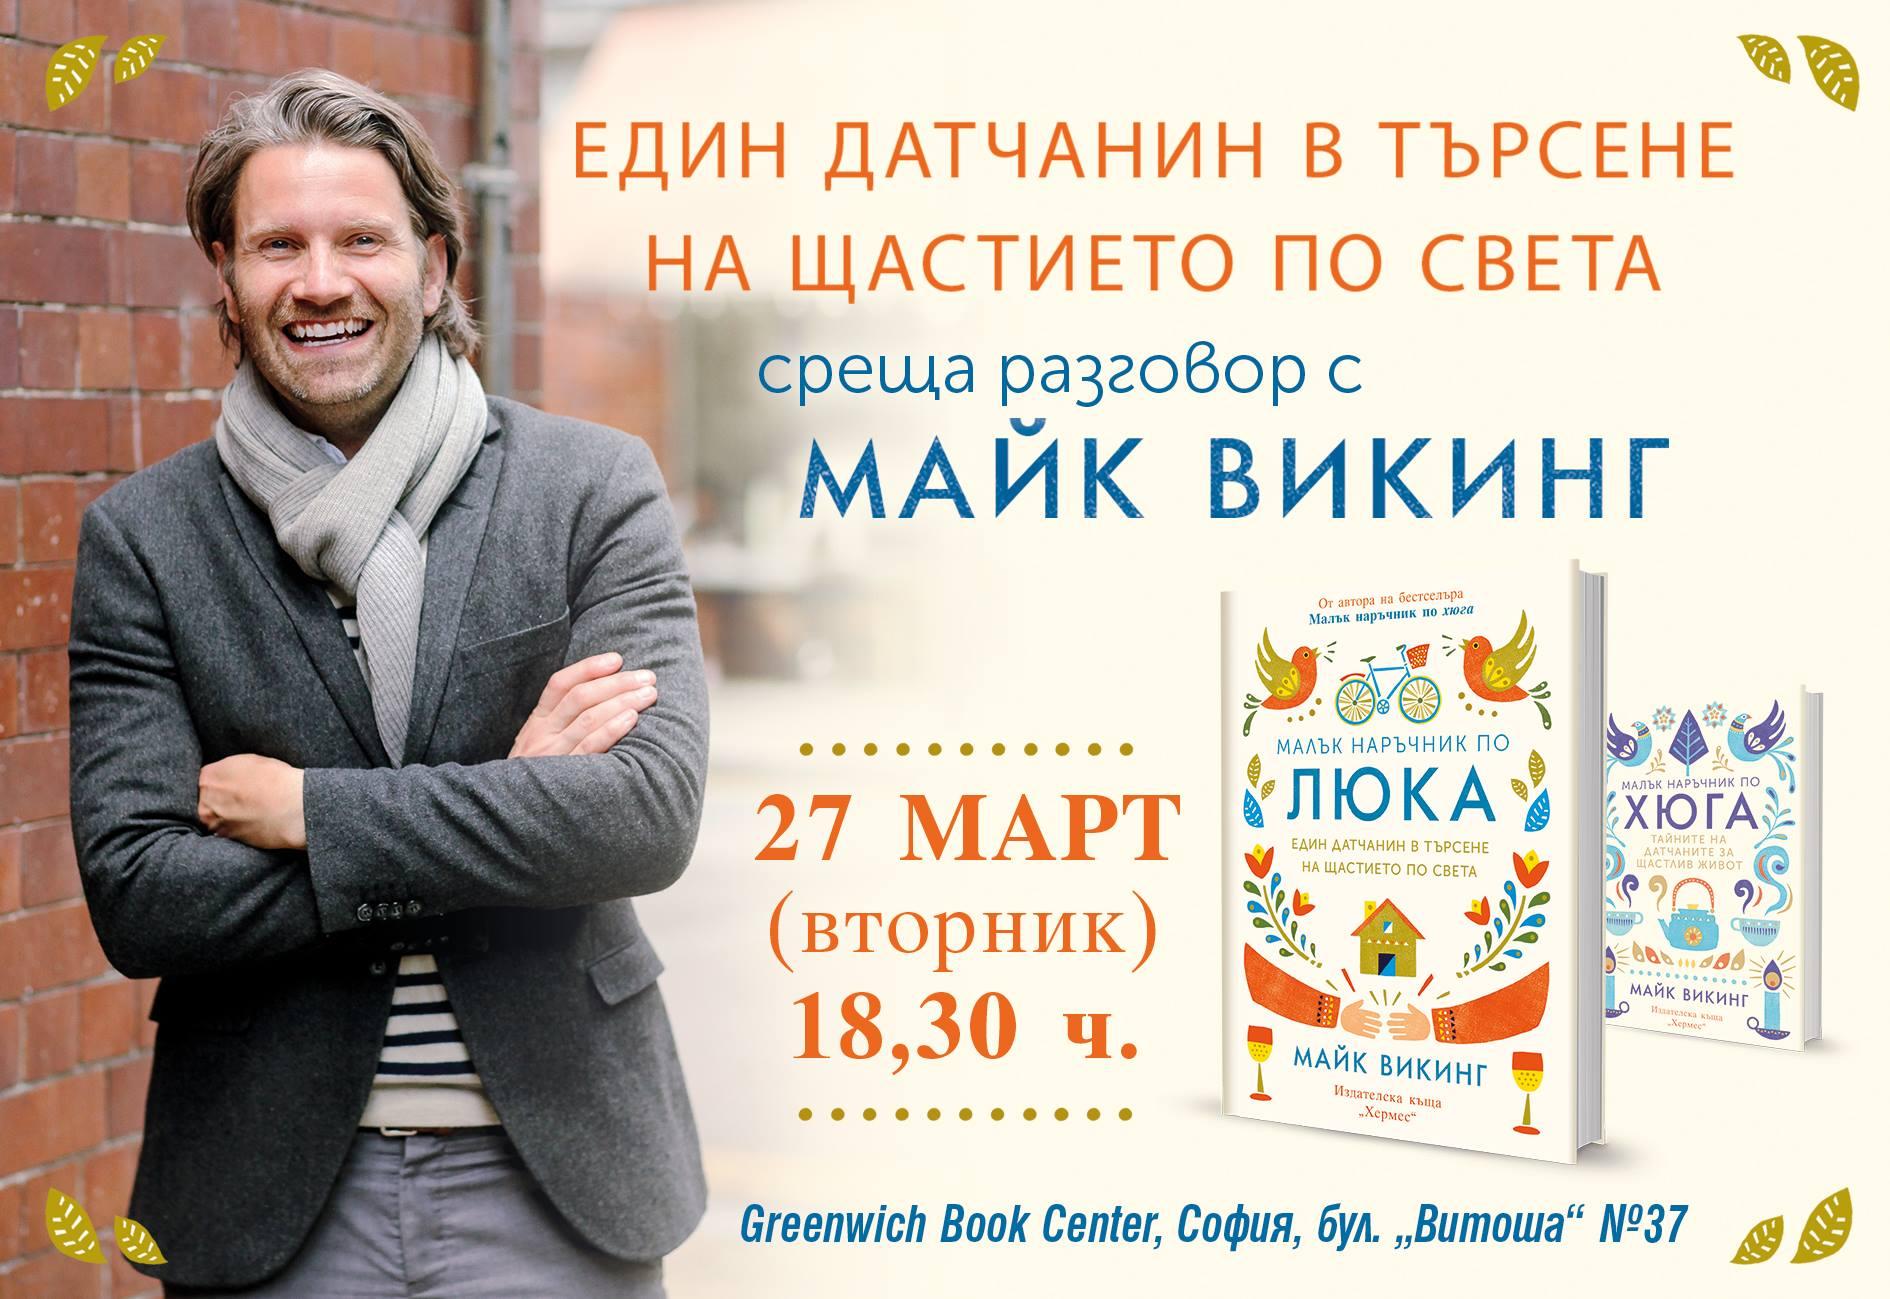 Среща разговор с Майк Викинг в София